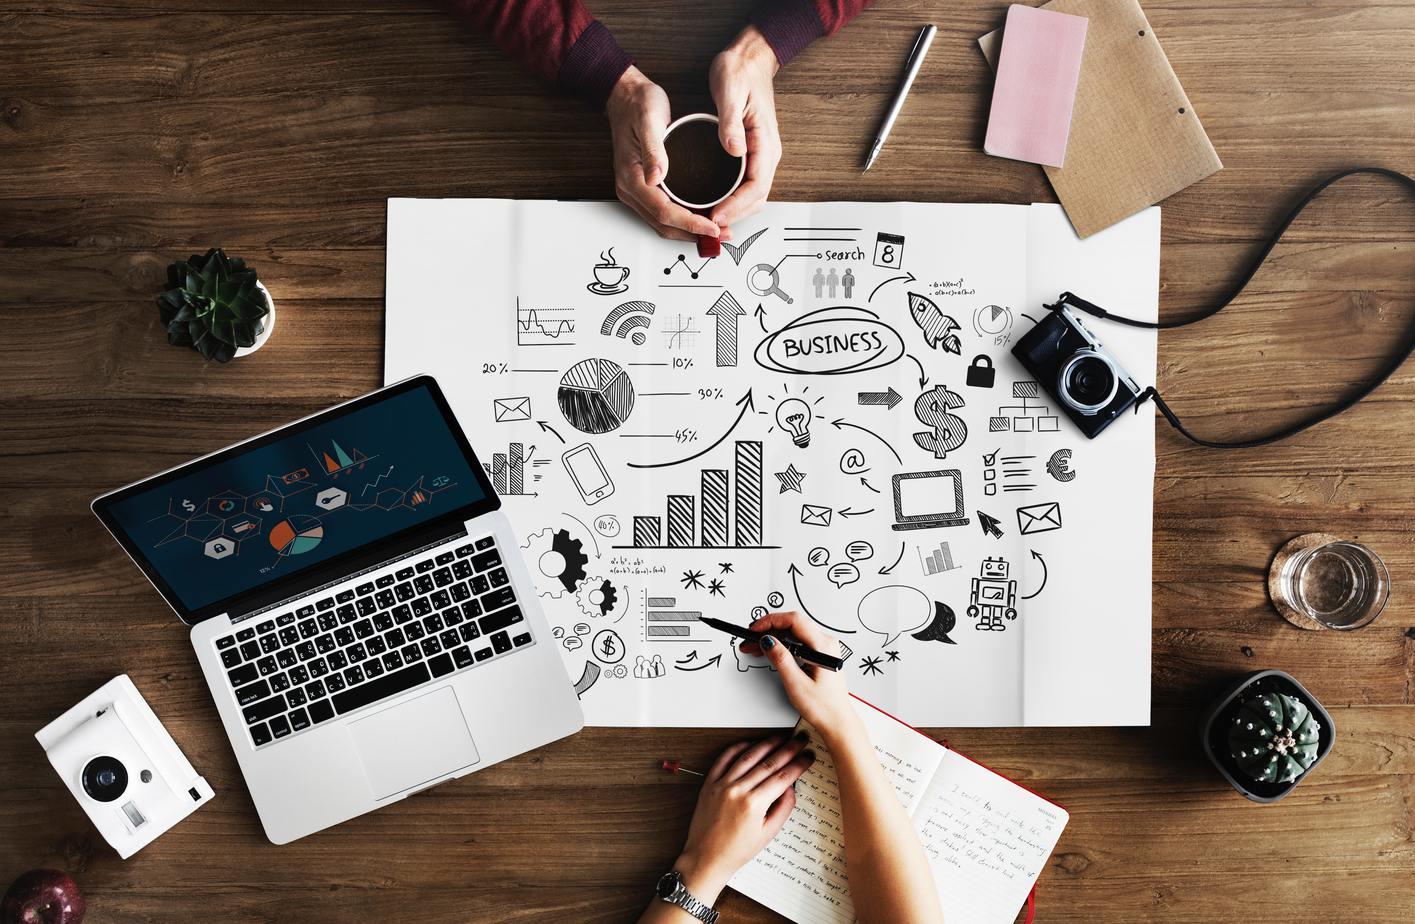 TAT0193 – Ohne Zahlen, kein Erfolg. Impulse für dein Social Media Reporting